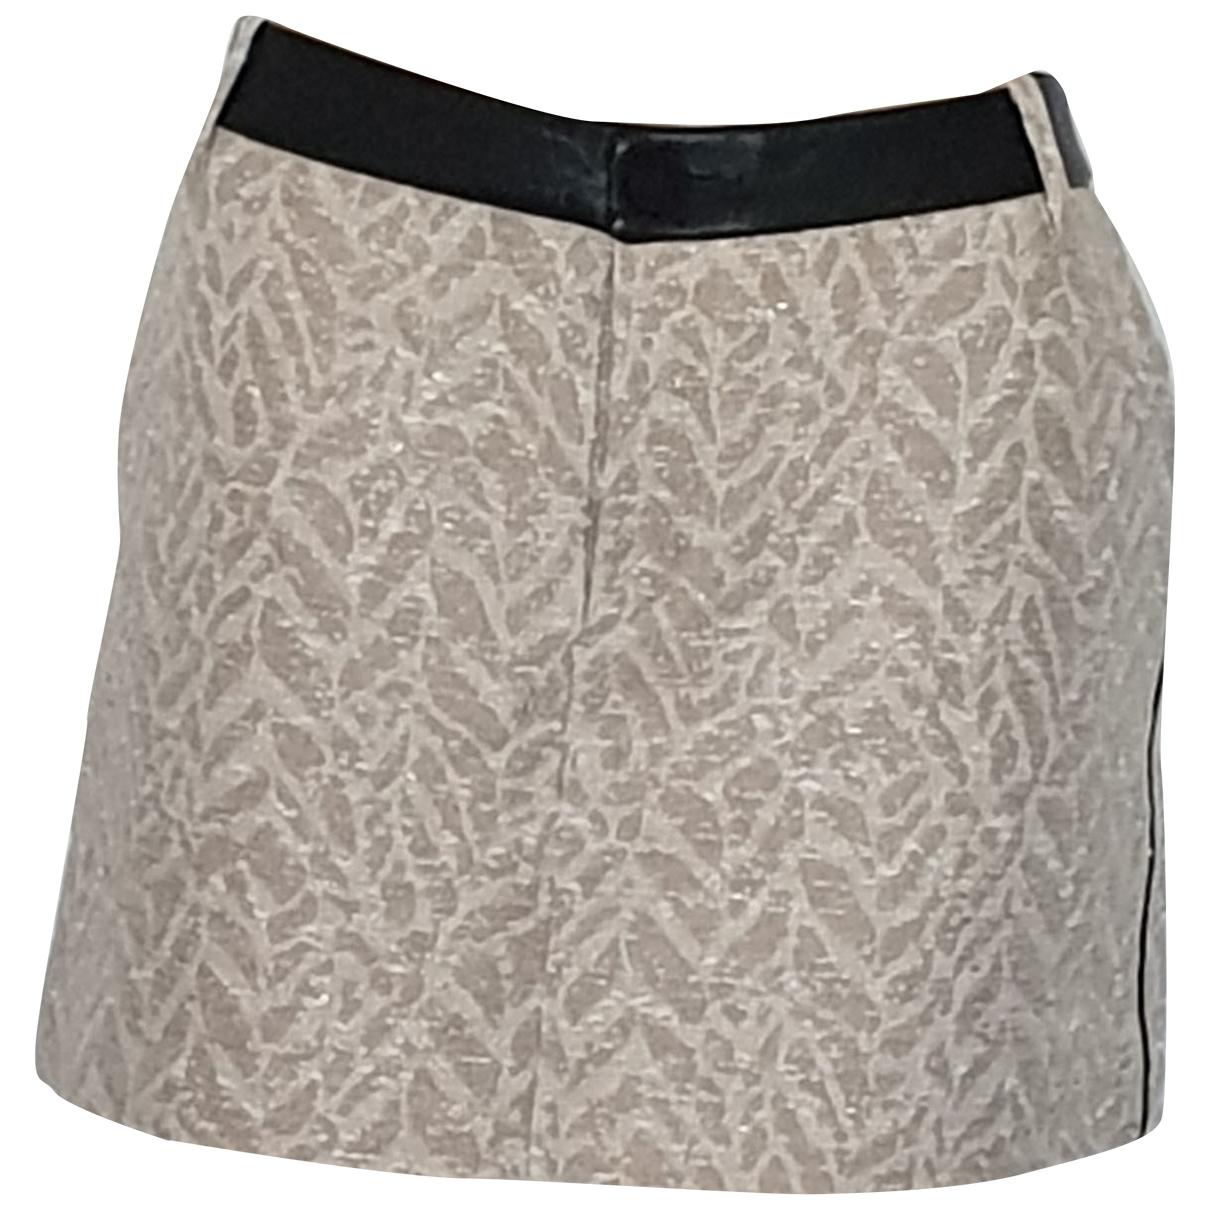 Zadig & Voltaire \N Beige Cotton skirt for Women 38 FR